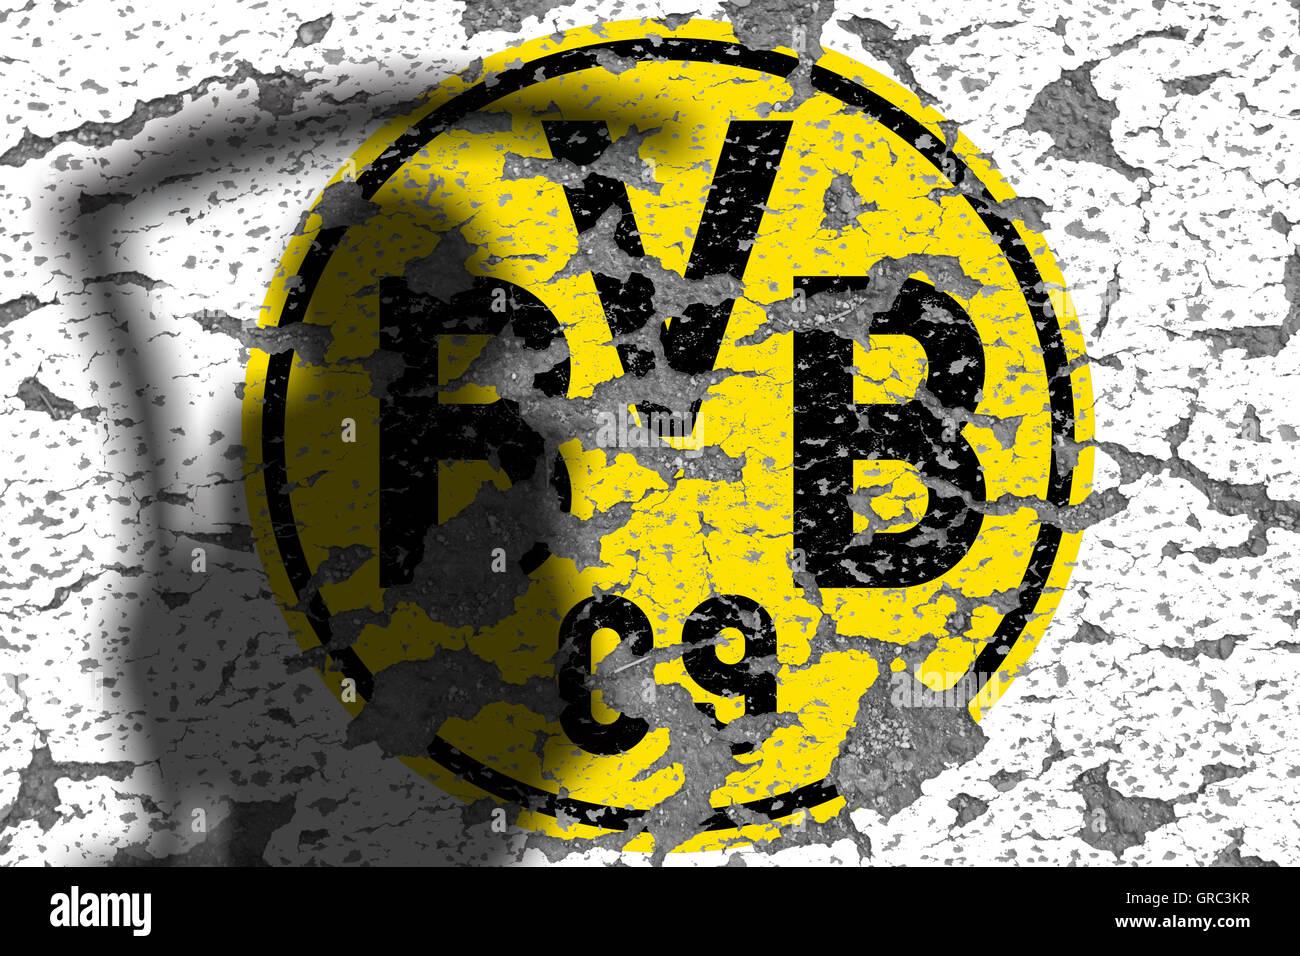 Eroding Logos Of Soccer Club Bvb Borussia Dortmund - Stock Image